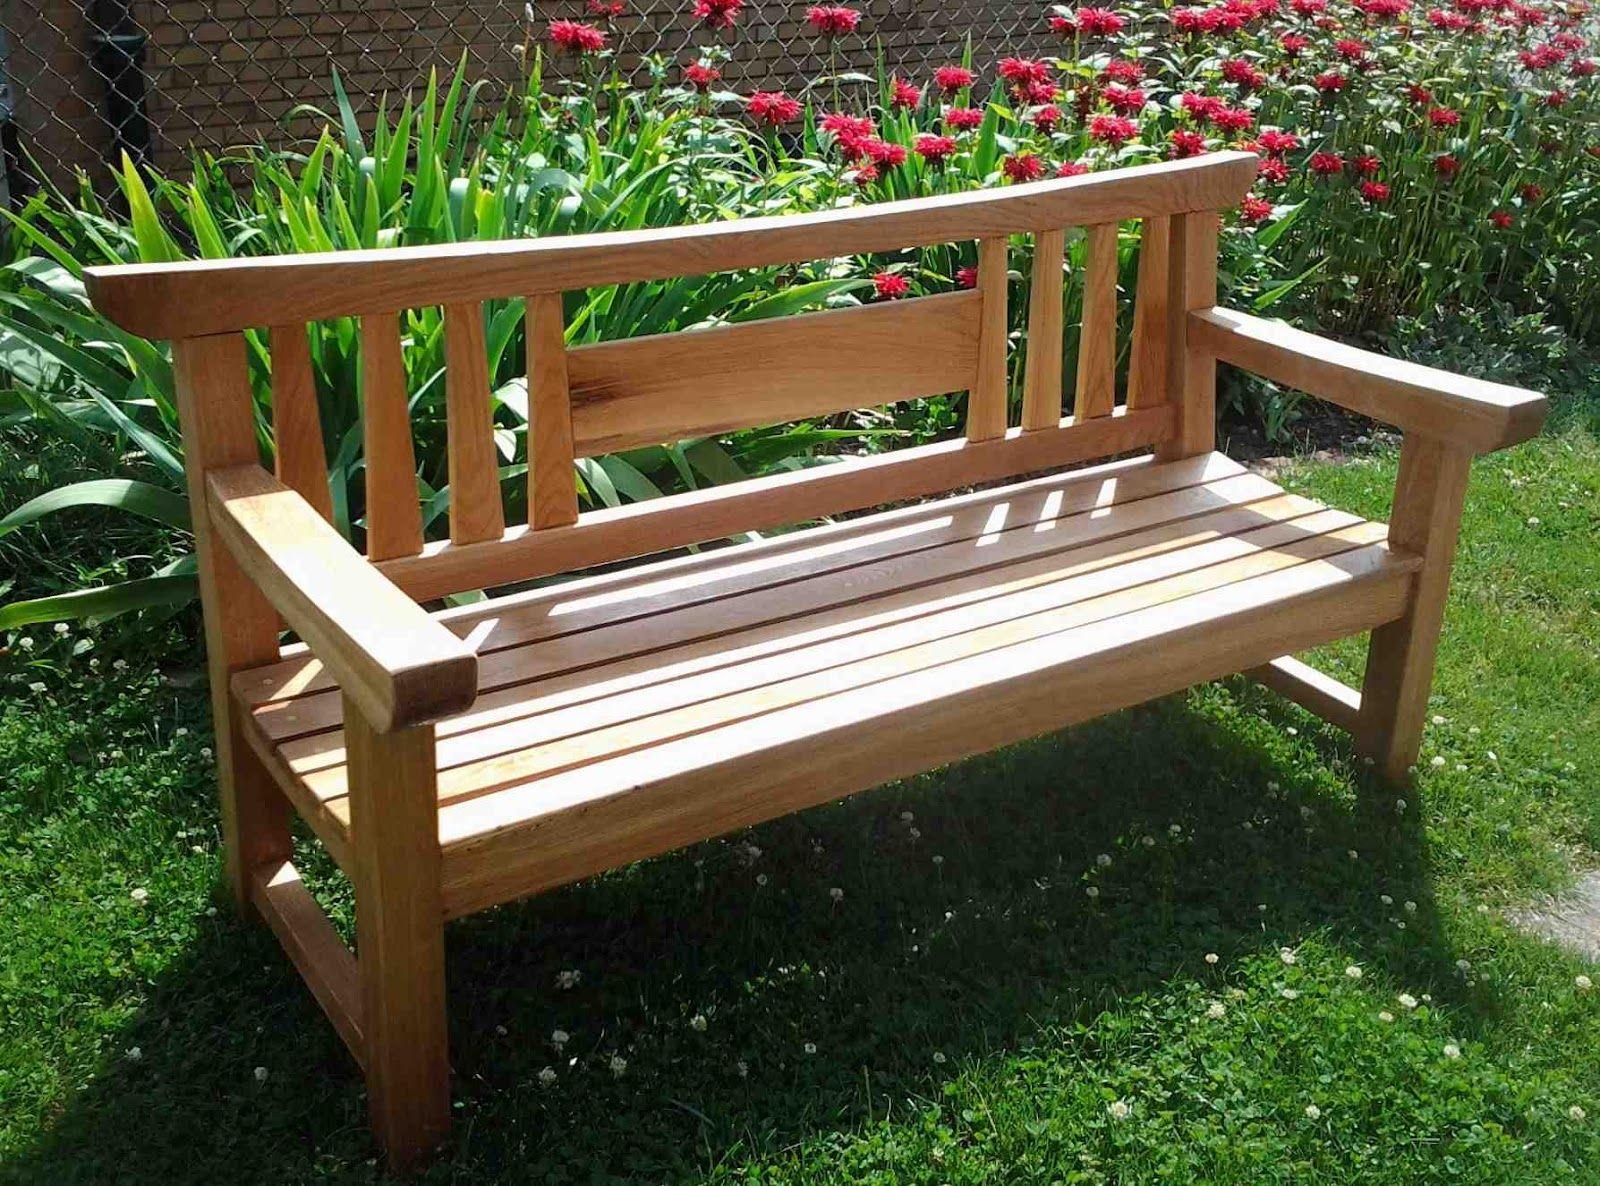 Japanese Garden Bench Teakholz Gartenbank Gartenmobel Design Aussensitzbank